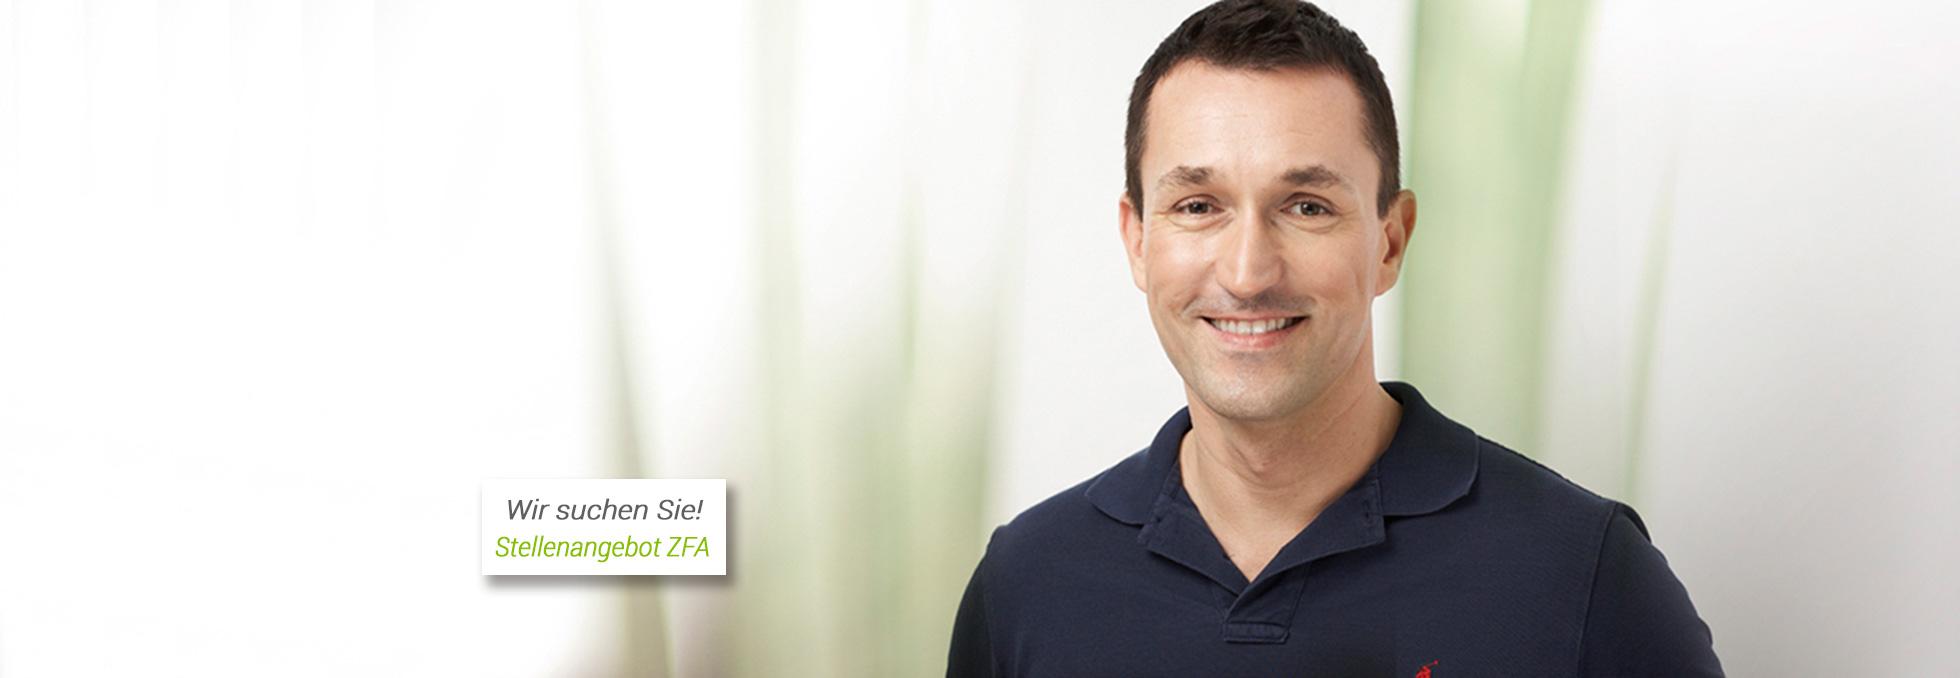 Zahnarzt Frankfurt Zentrum - Dr. Torsten Krell